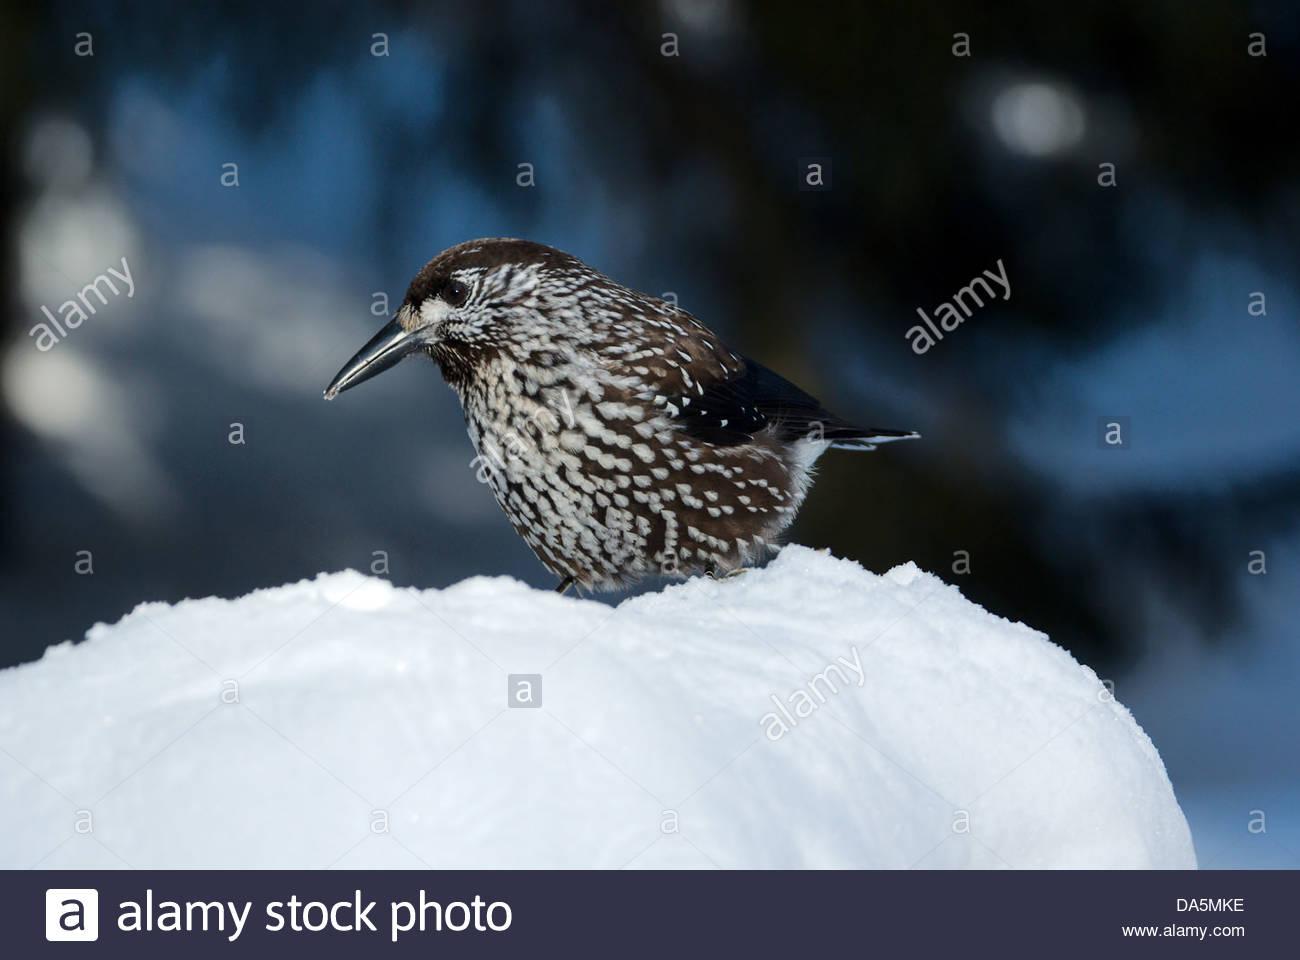 Switzerland, Europe, Arosa, bird, birds songbird, nutcracker, forest, snow - Stock Image